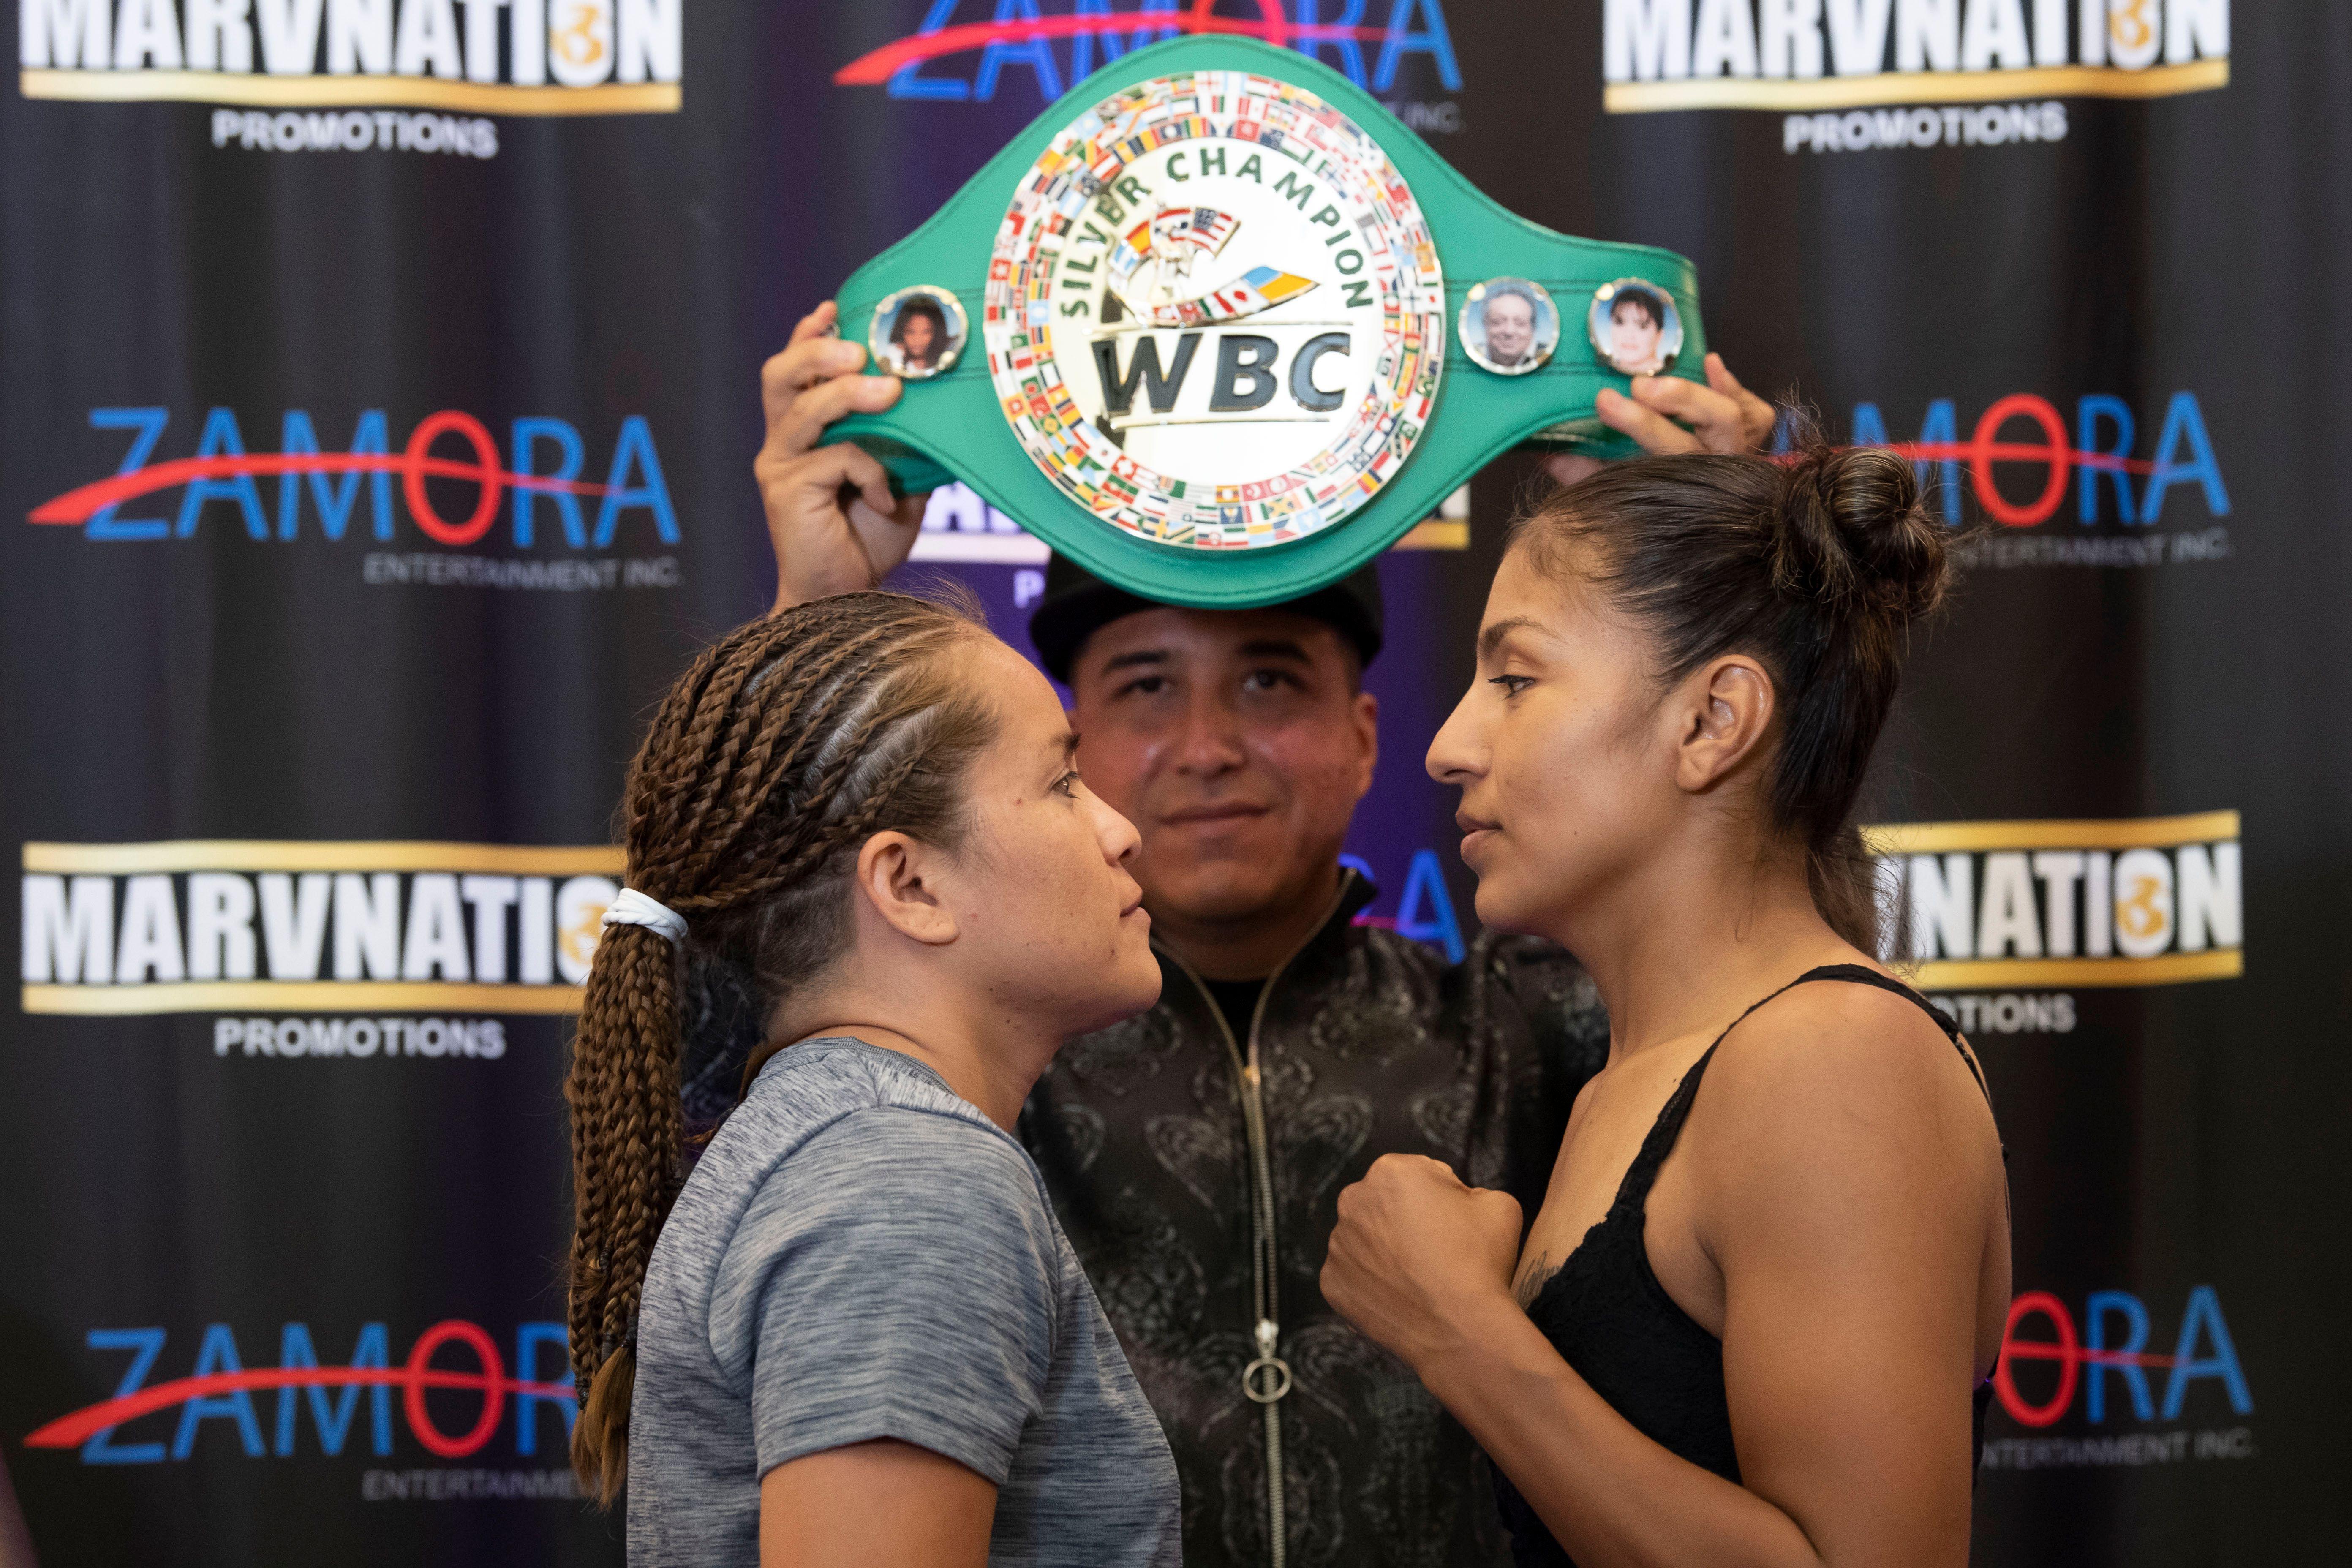 Adelaida Ruiz vs. Nancy Franco weights from California, USA   Boxen247.com (Kristian von Sponneck)